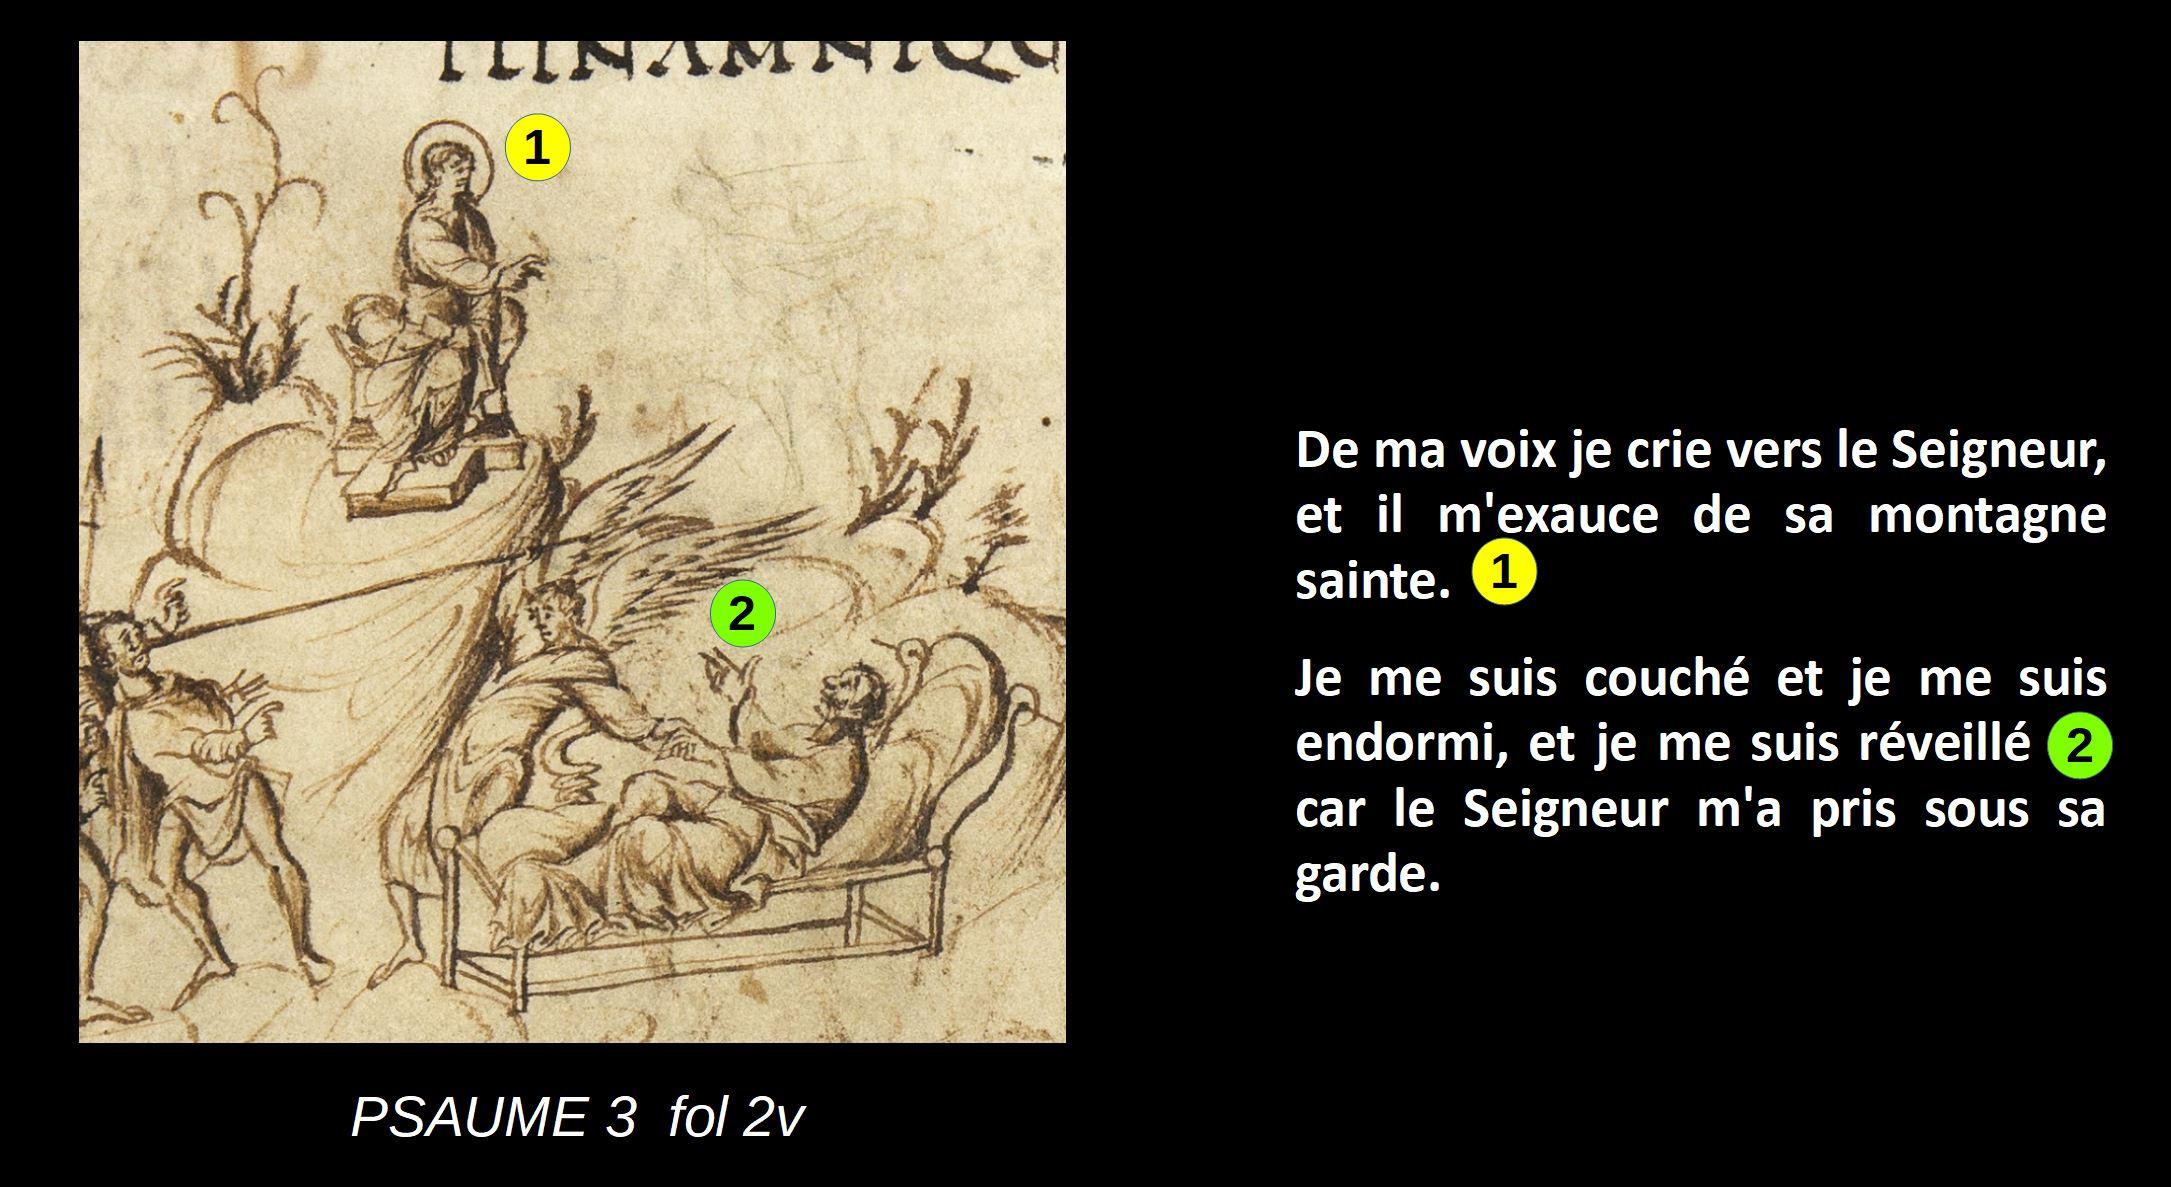 Utrecht Psalter PSAUME 3 fol 2v schema